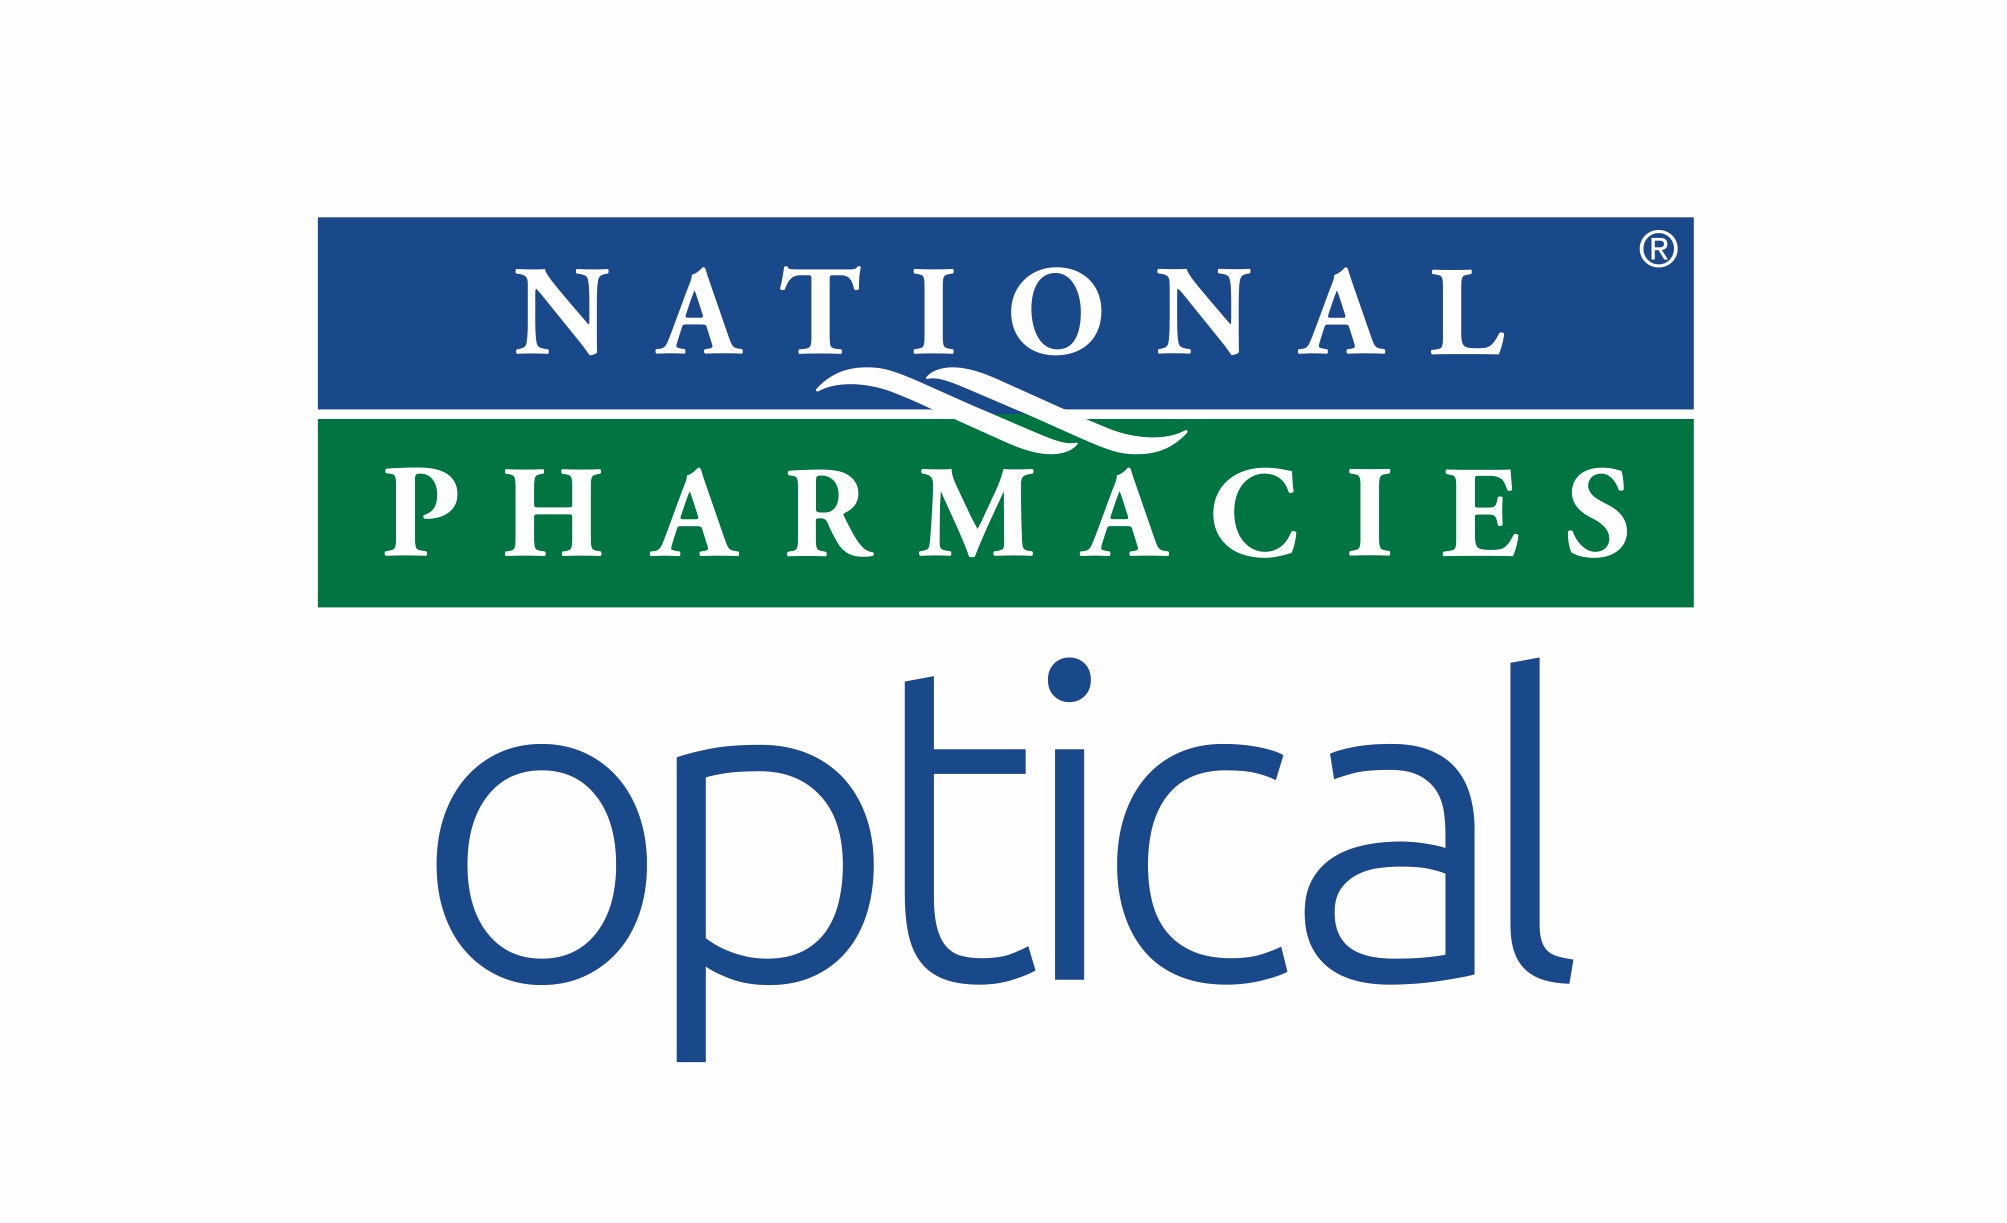 National Pharmacies Optical